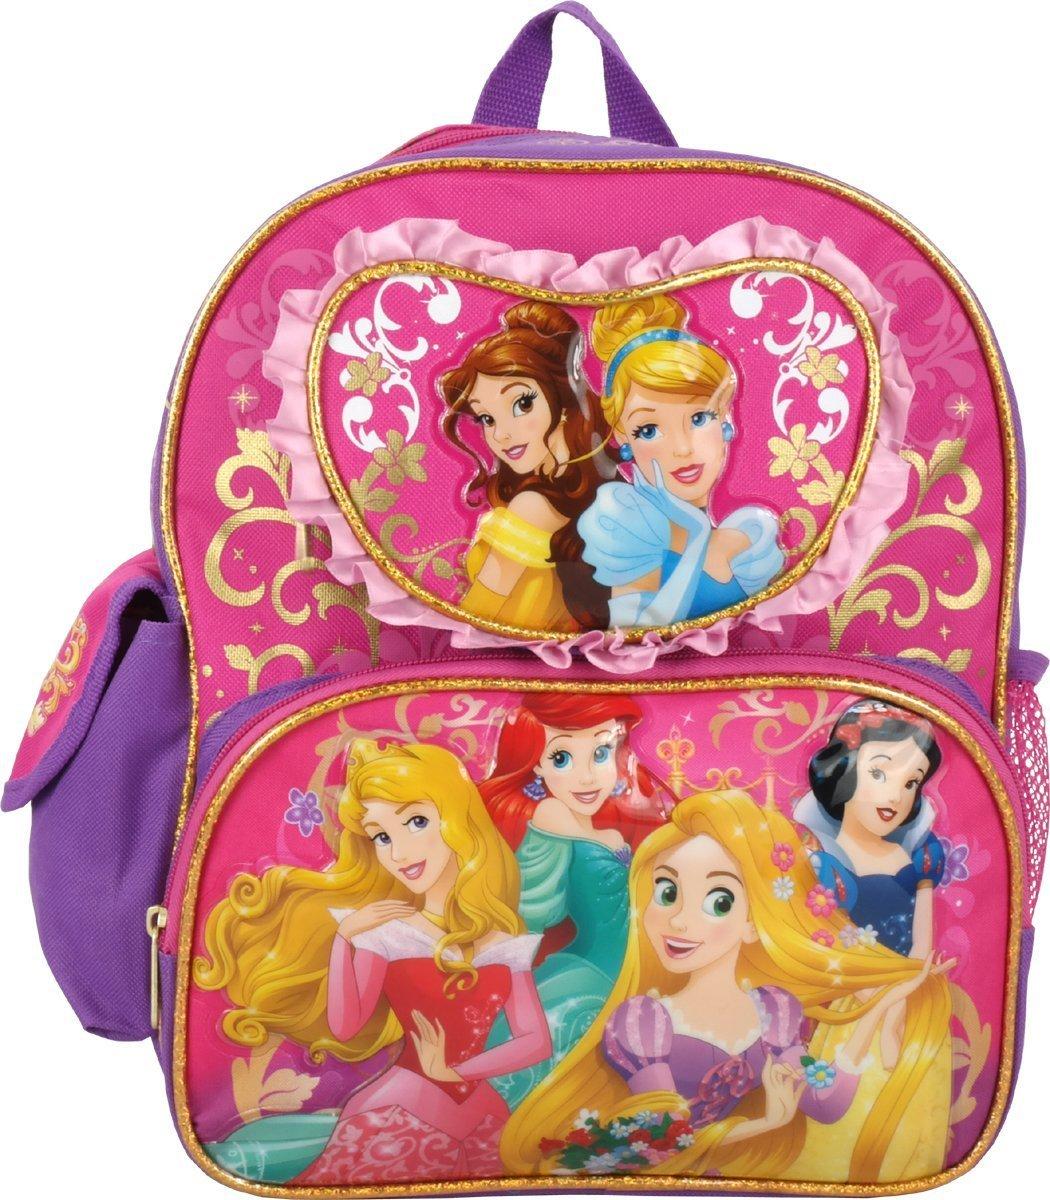 Disney Princess Cinderella Rapunzel Ariel 12